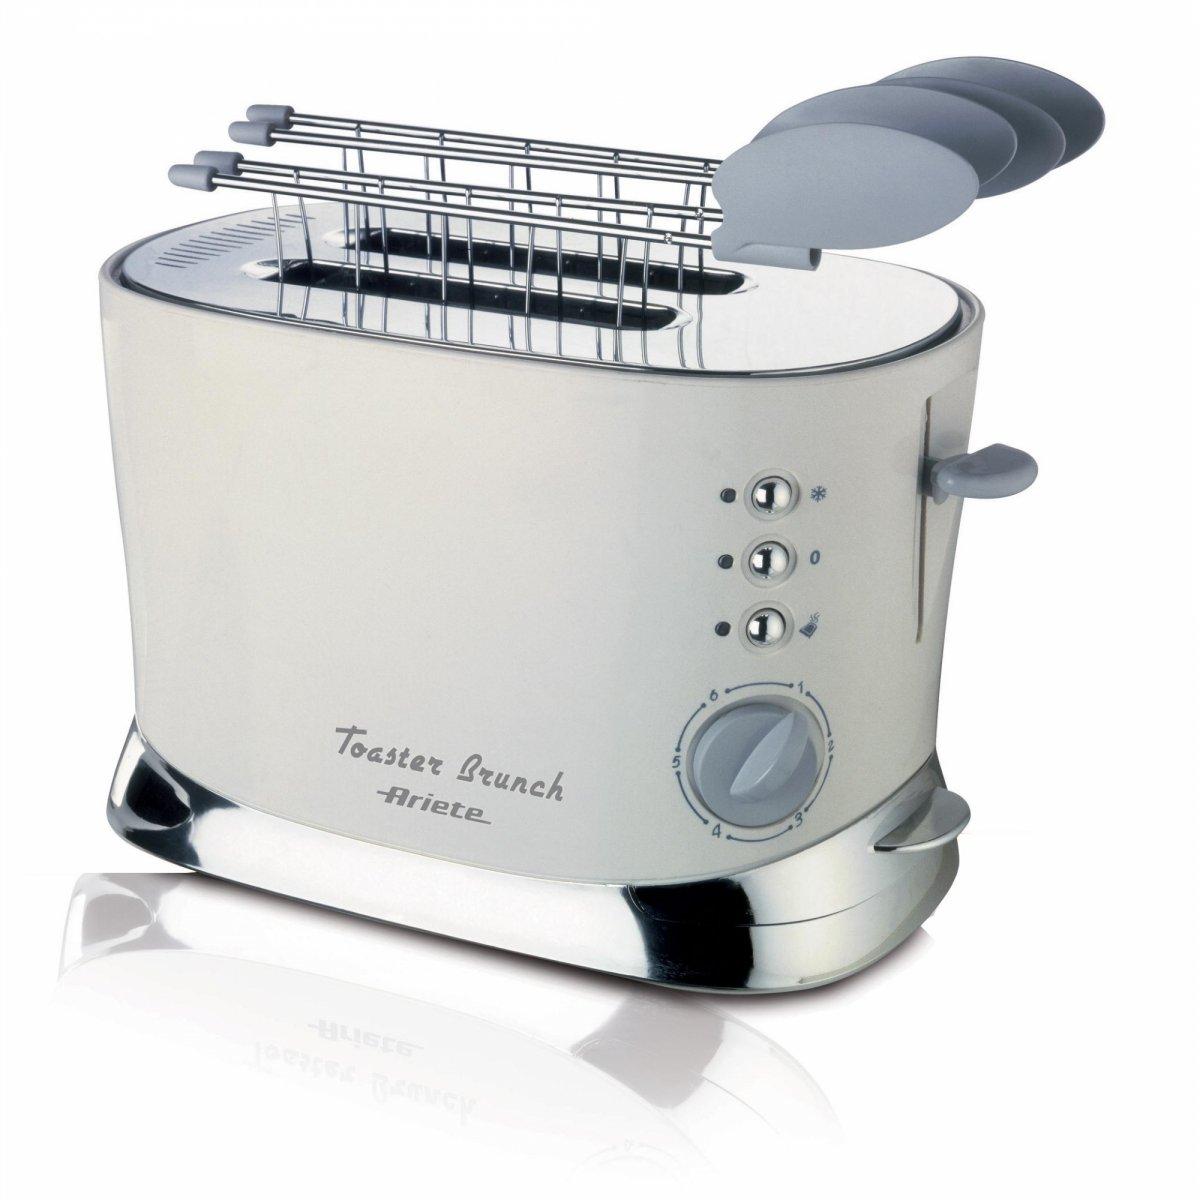 Ariete tostapane toaster brunch ariete elettrodomestici for Ariete elettrodomestici